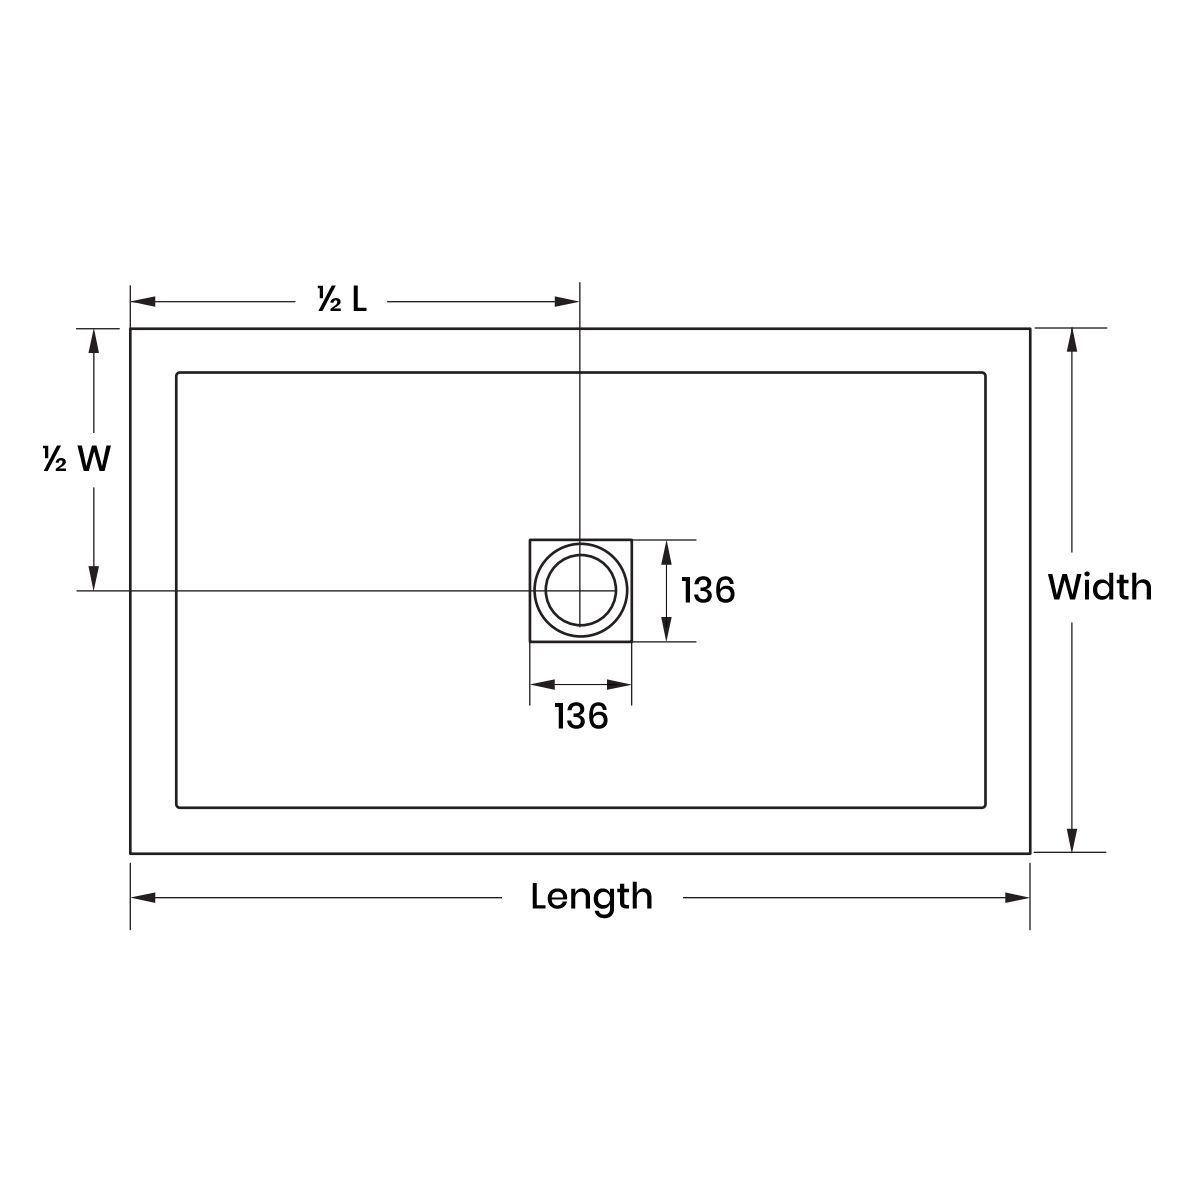 Aquadart White Slate Shower Tray 1600 x 700 Dimension